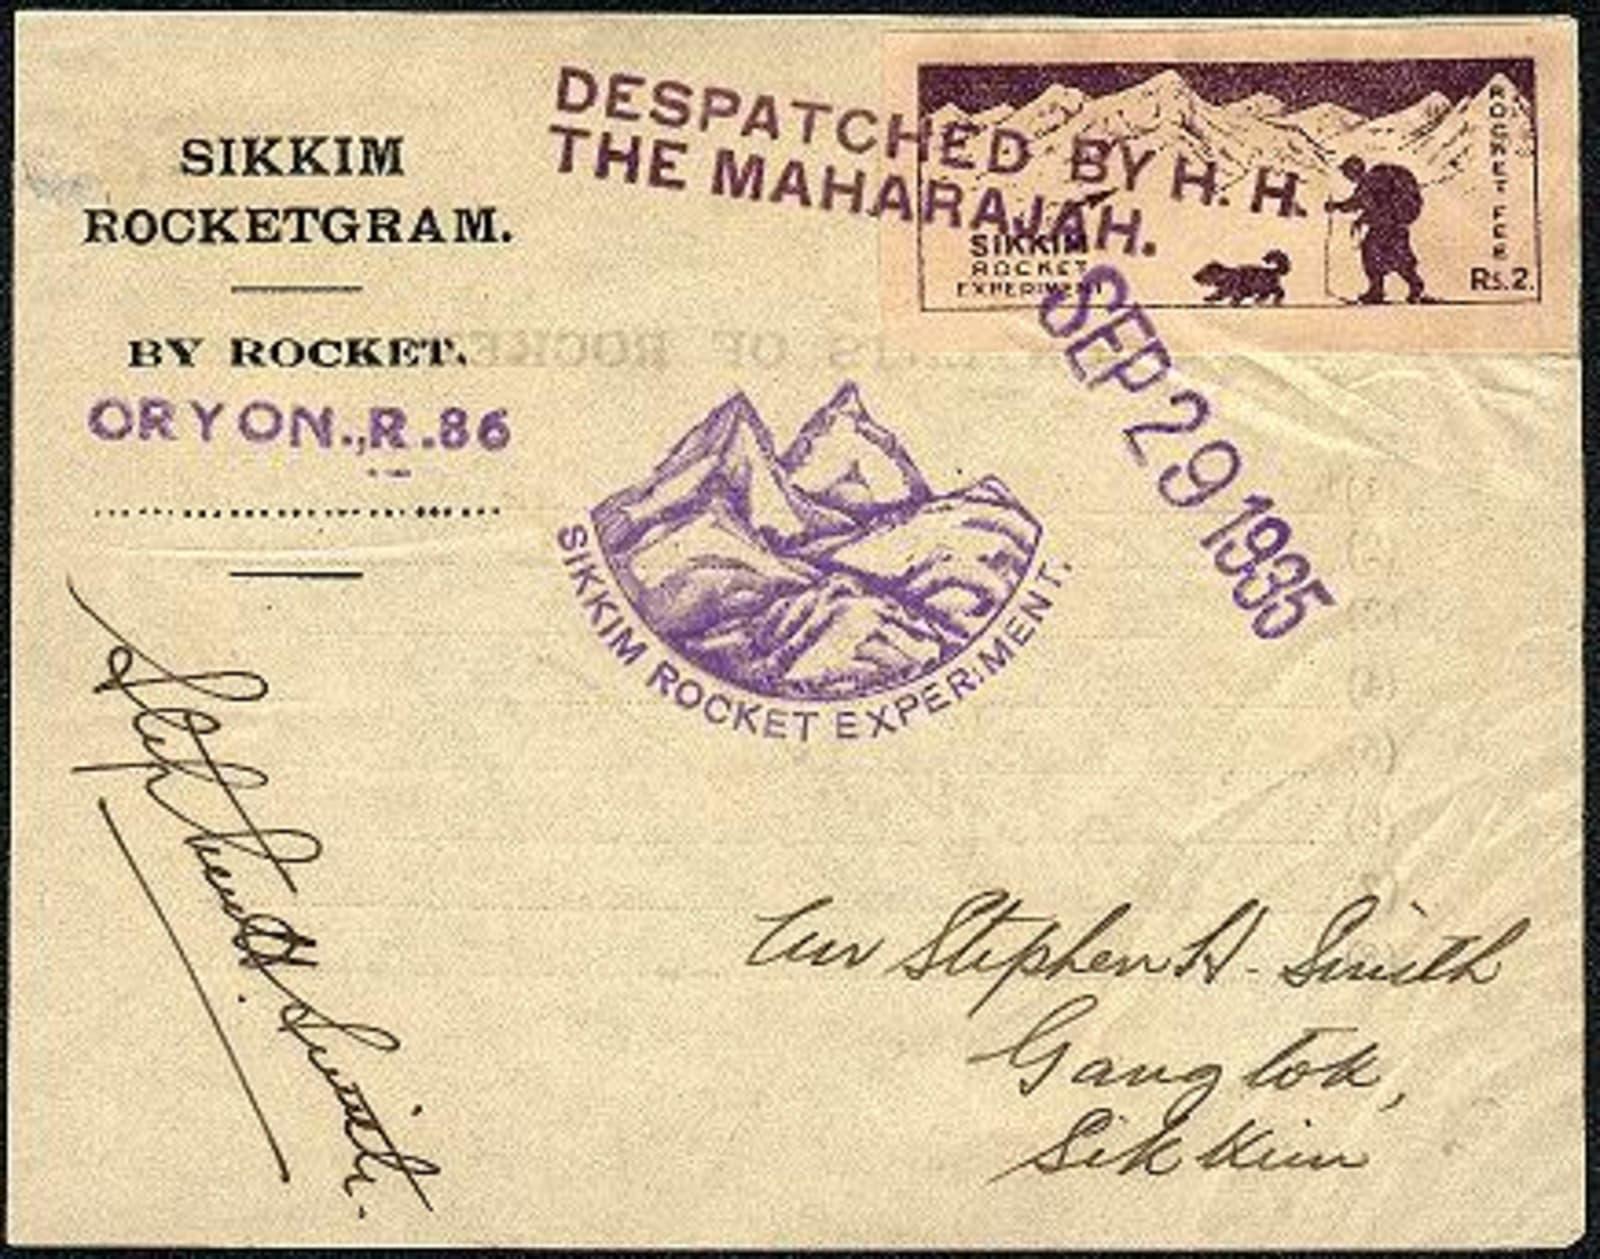 Stephen Smith rocket mail